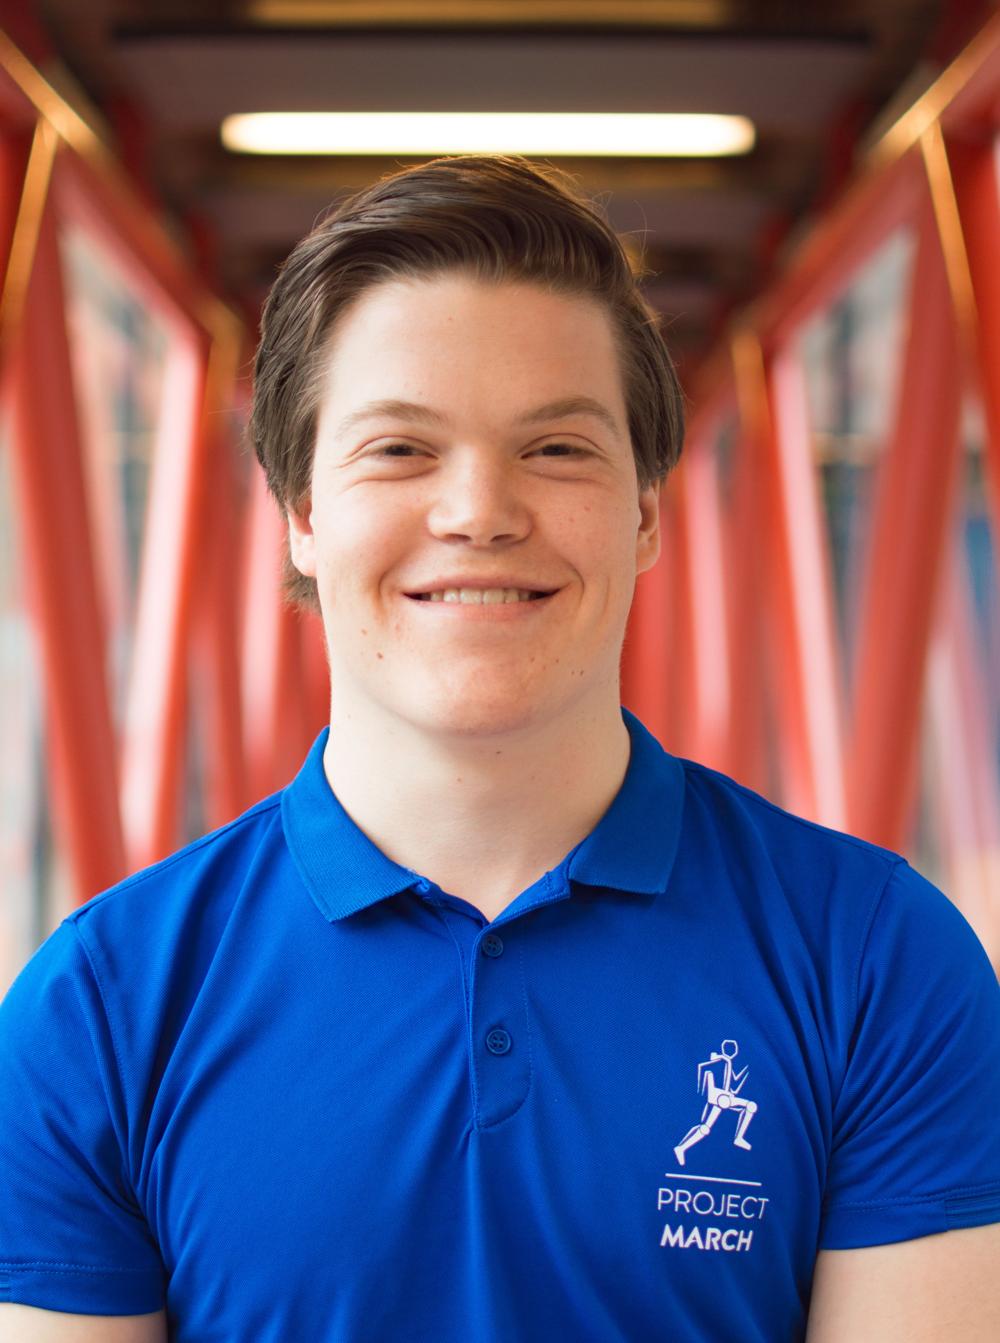 Thomas van der Sijs - Project Manager